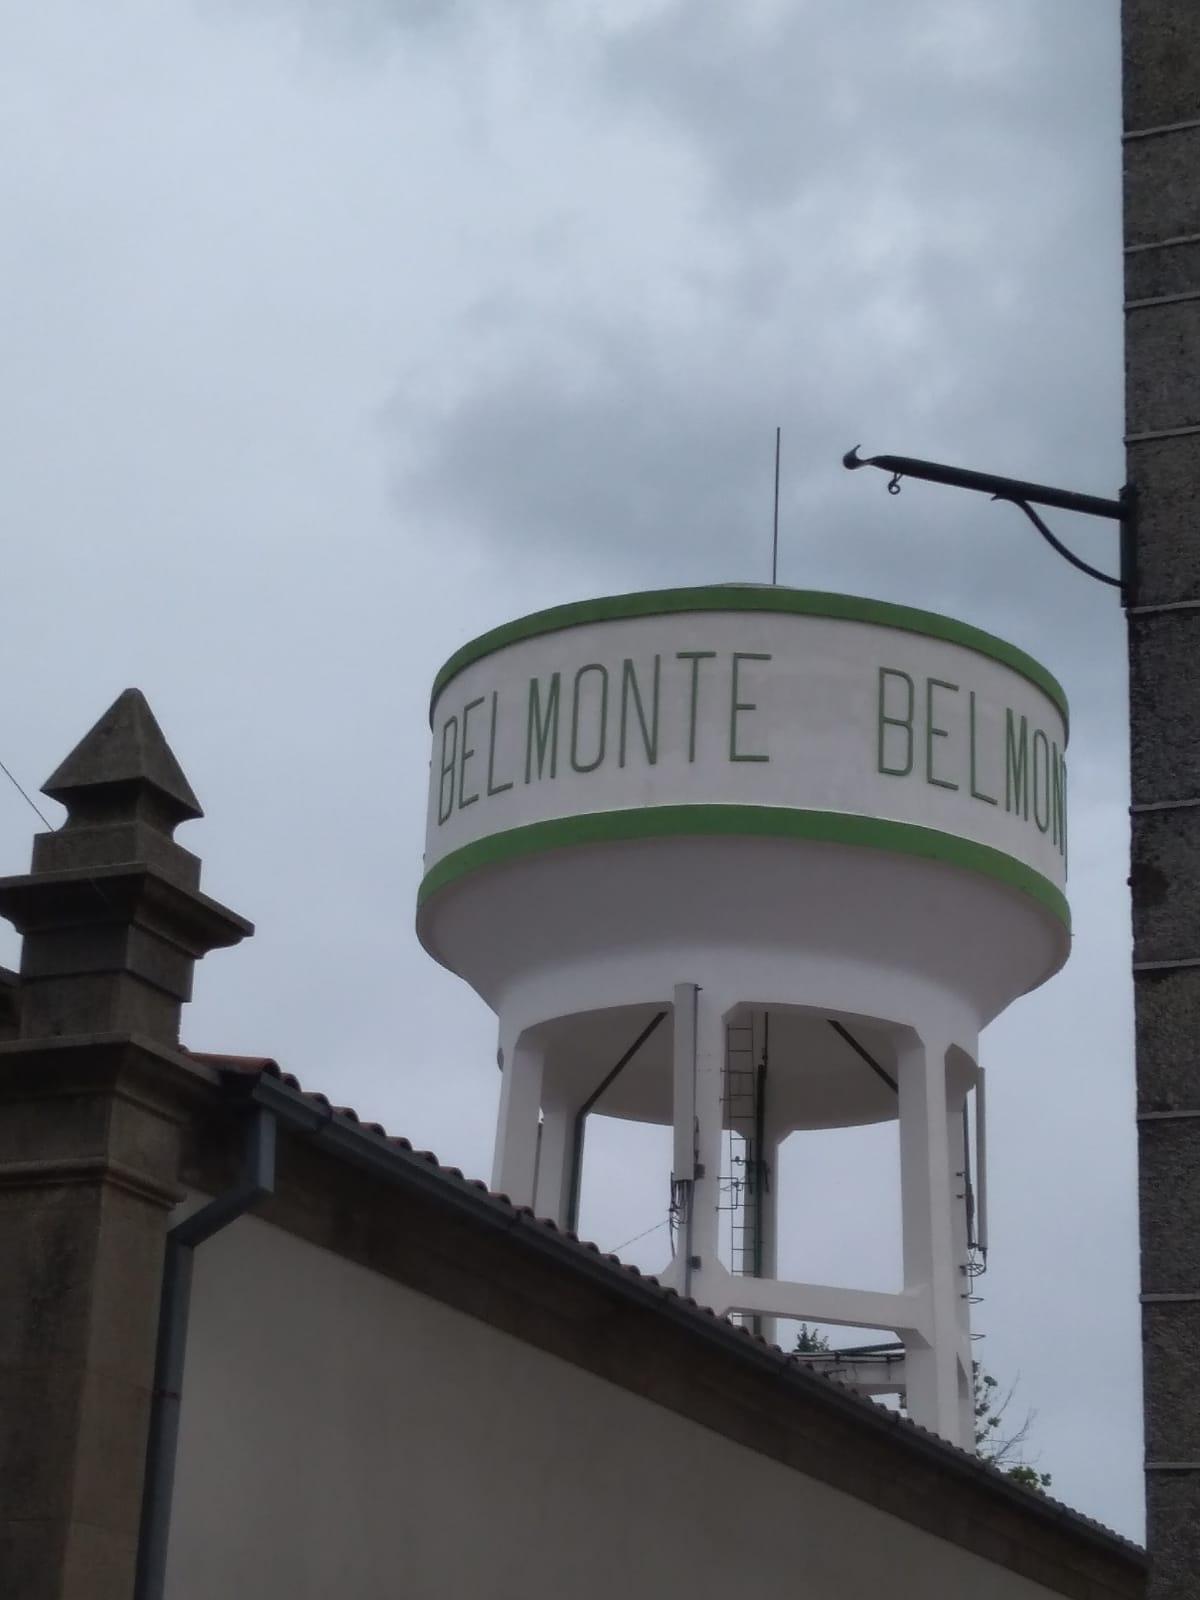 BELMONTE-52